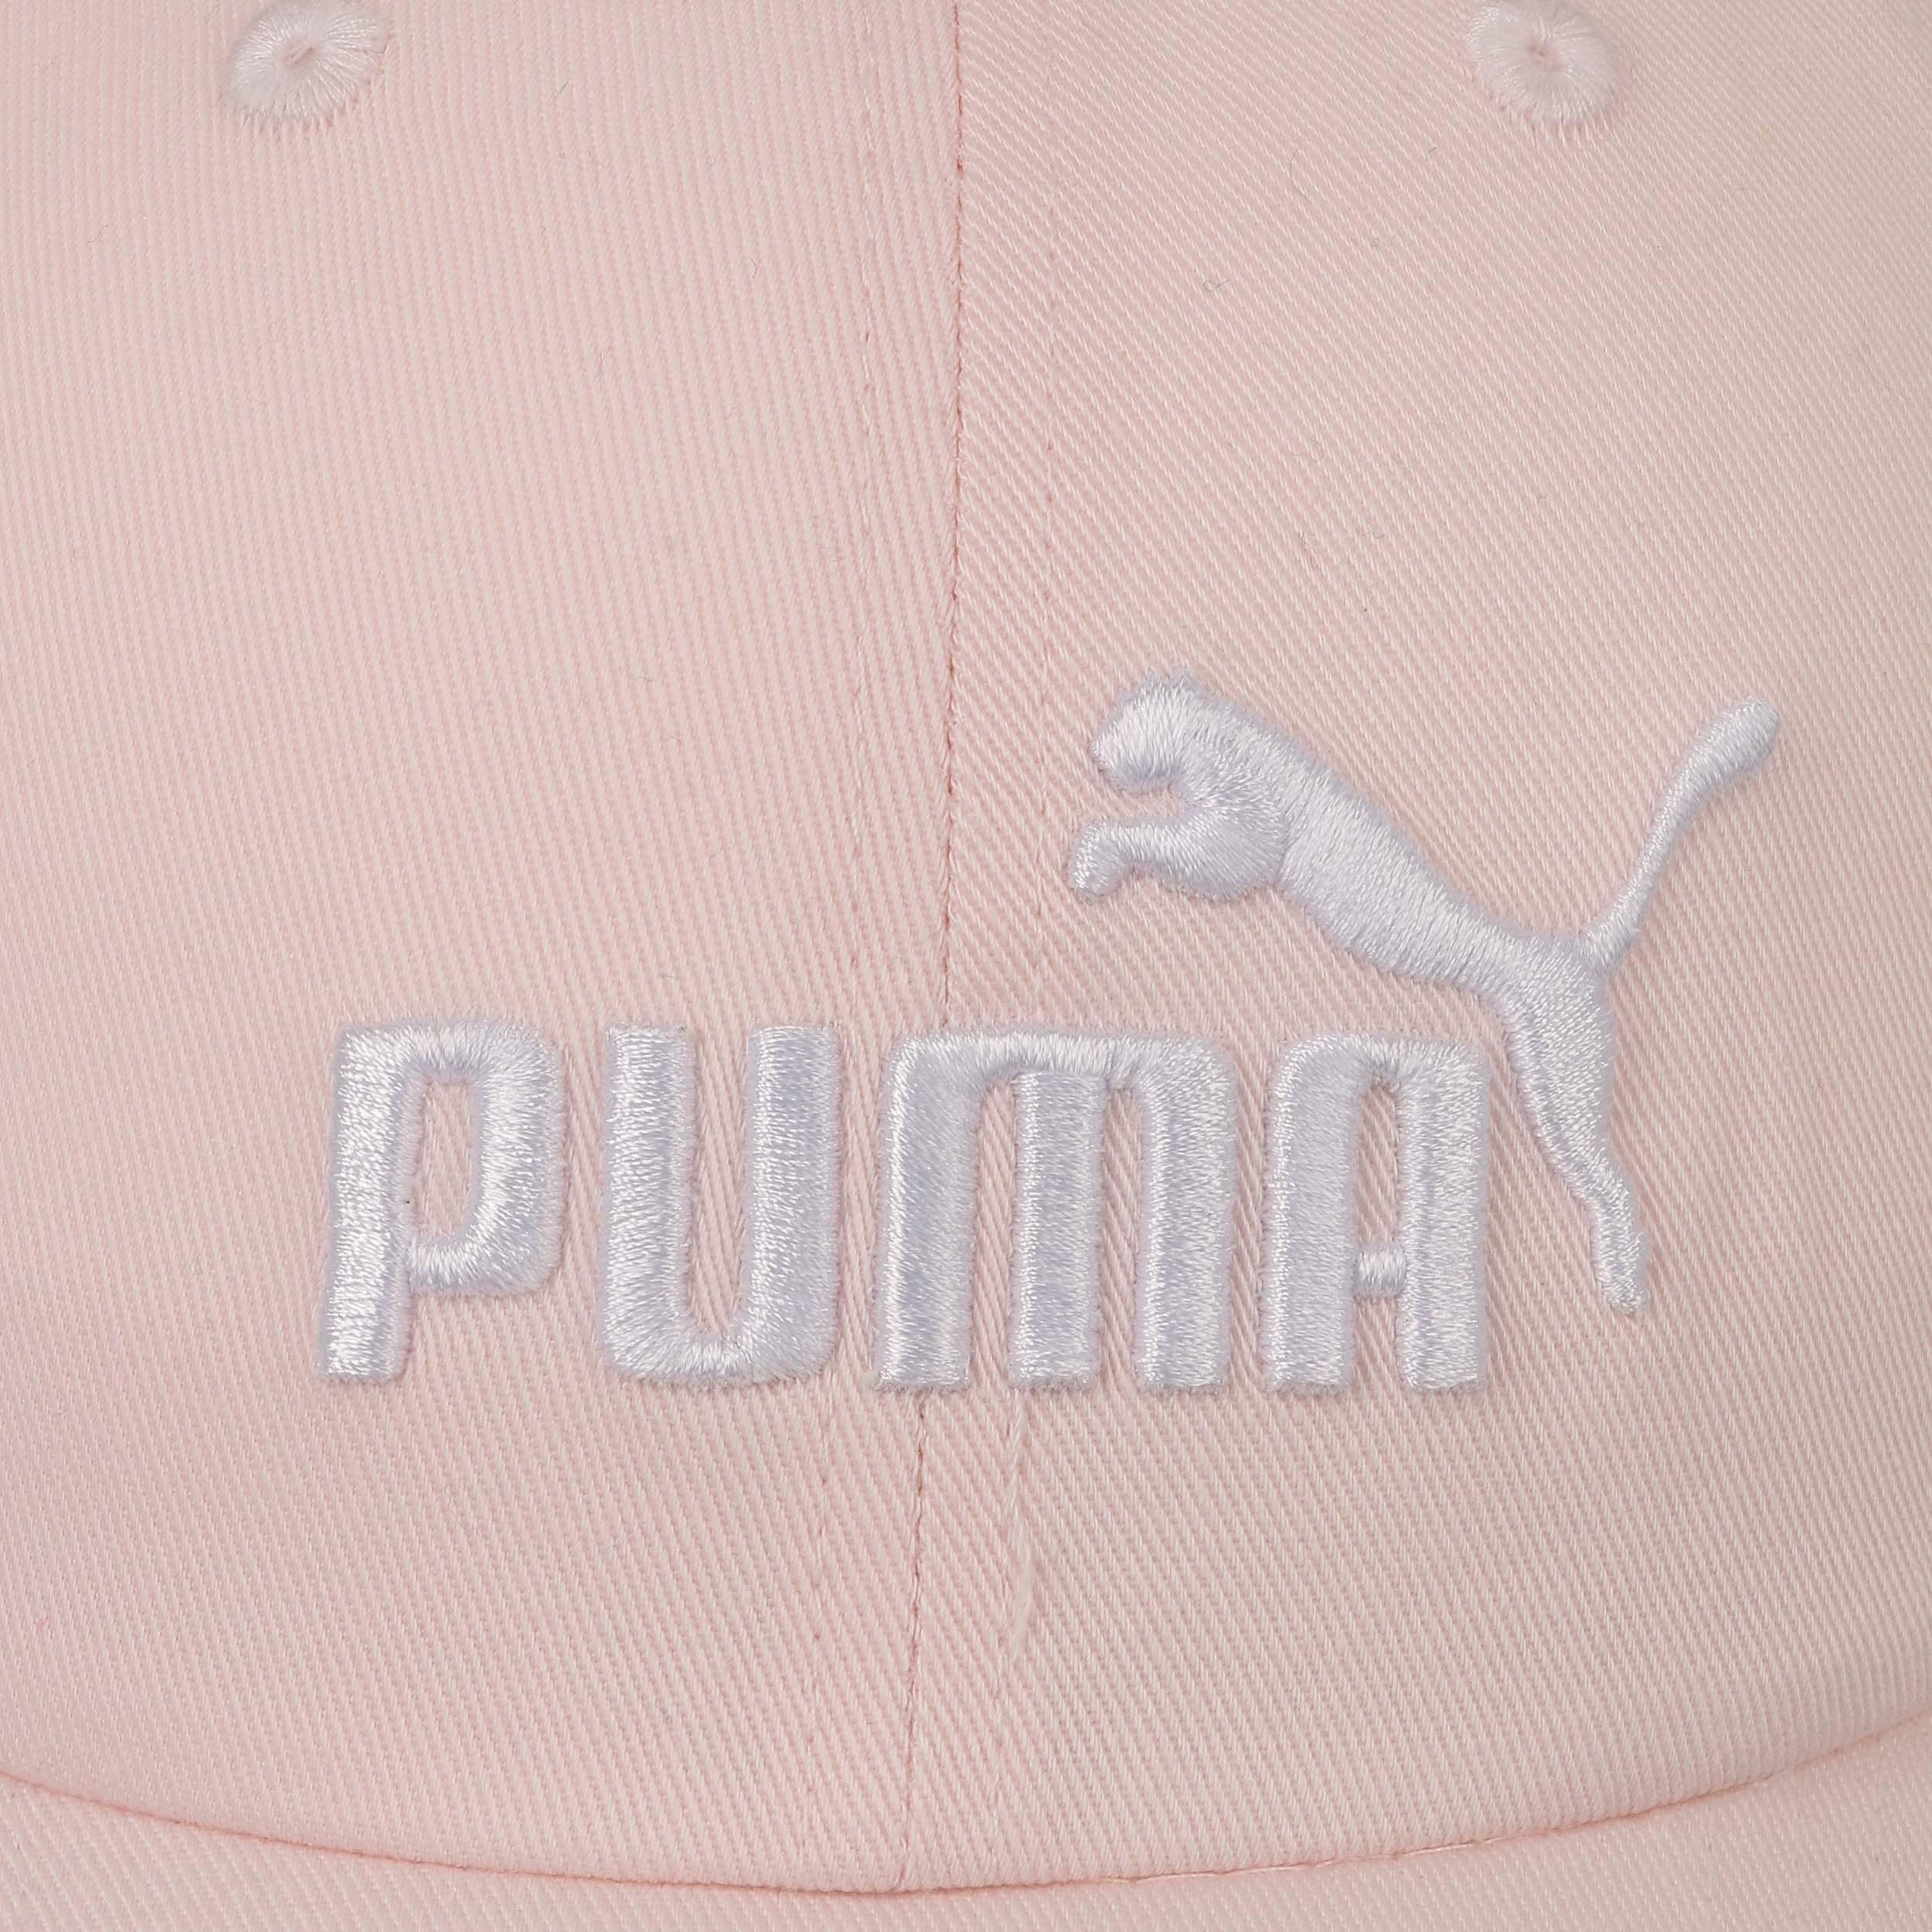 a2f587f0b8c No. 1 Baseball Cap by PUMA, EUR 14,95 --> Hats, caps & beanies shop ...